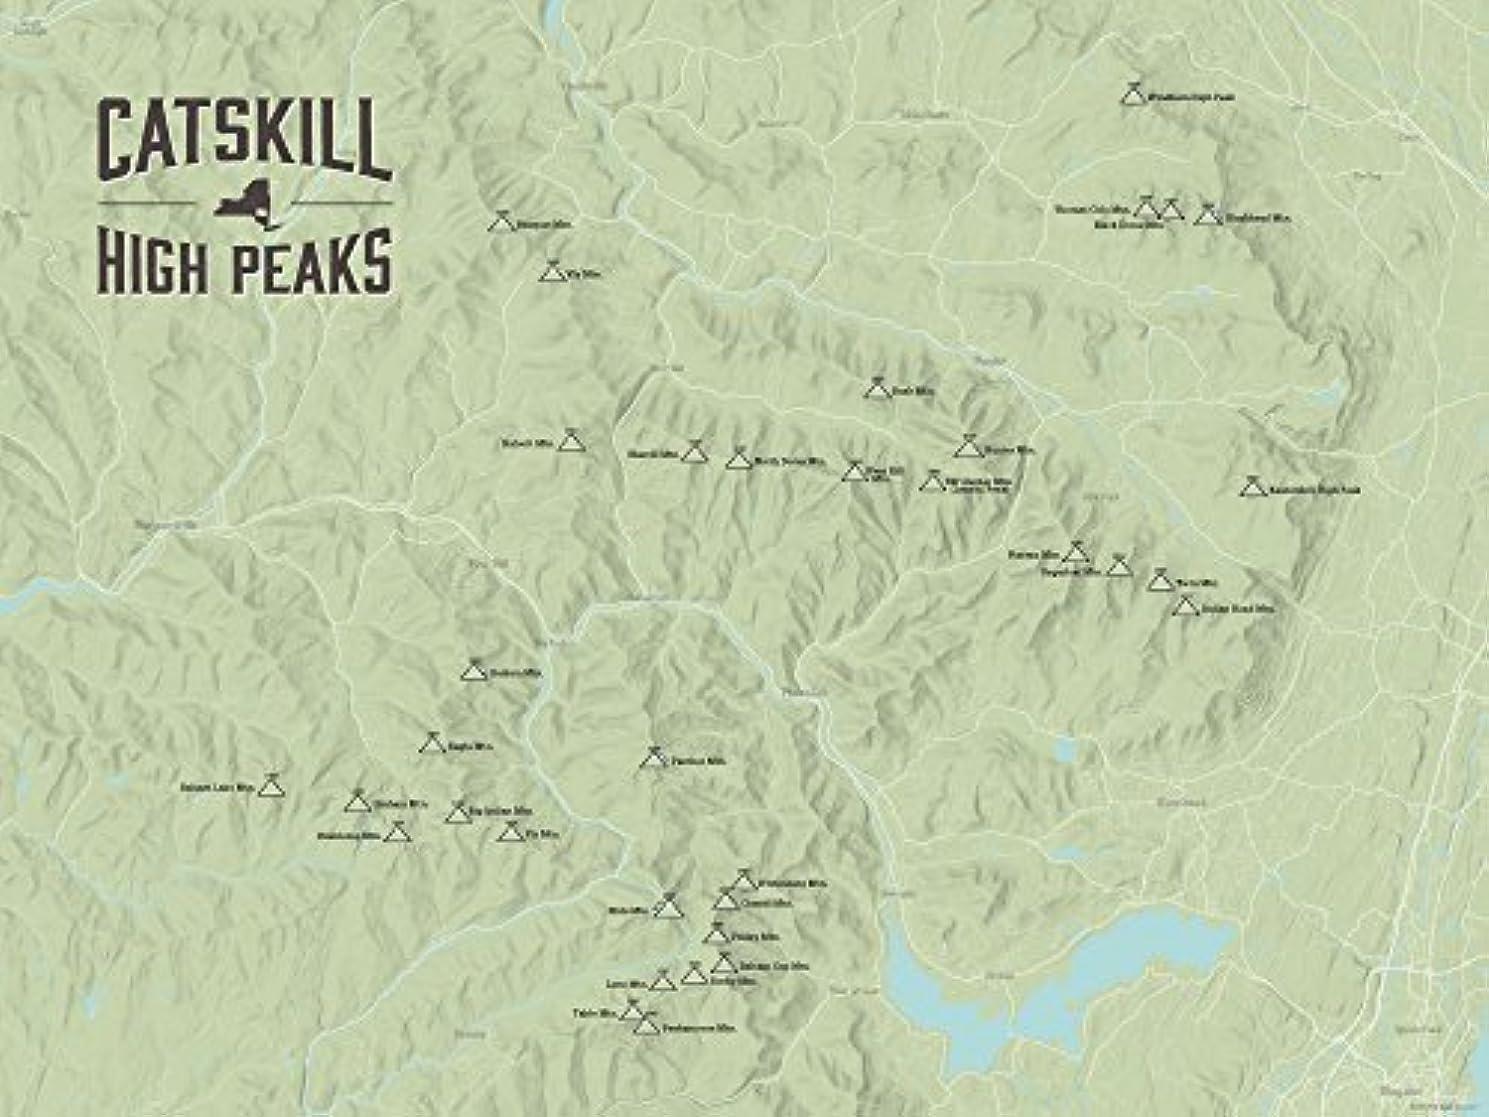 Catskill High Peaks Map 18x24 Poster (Sage)